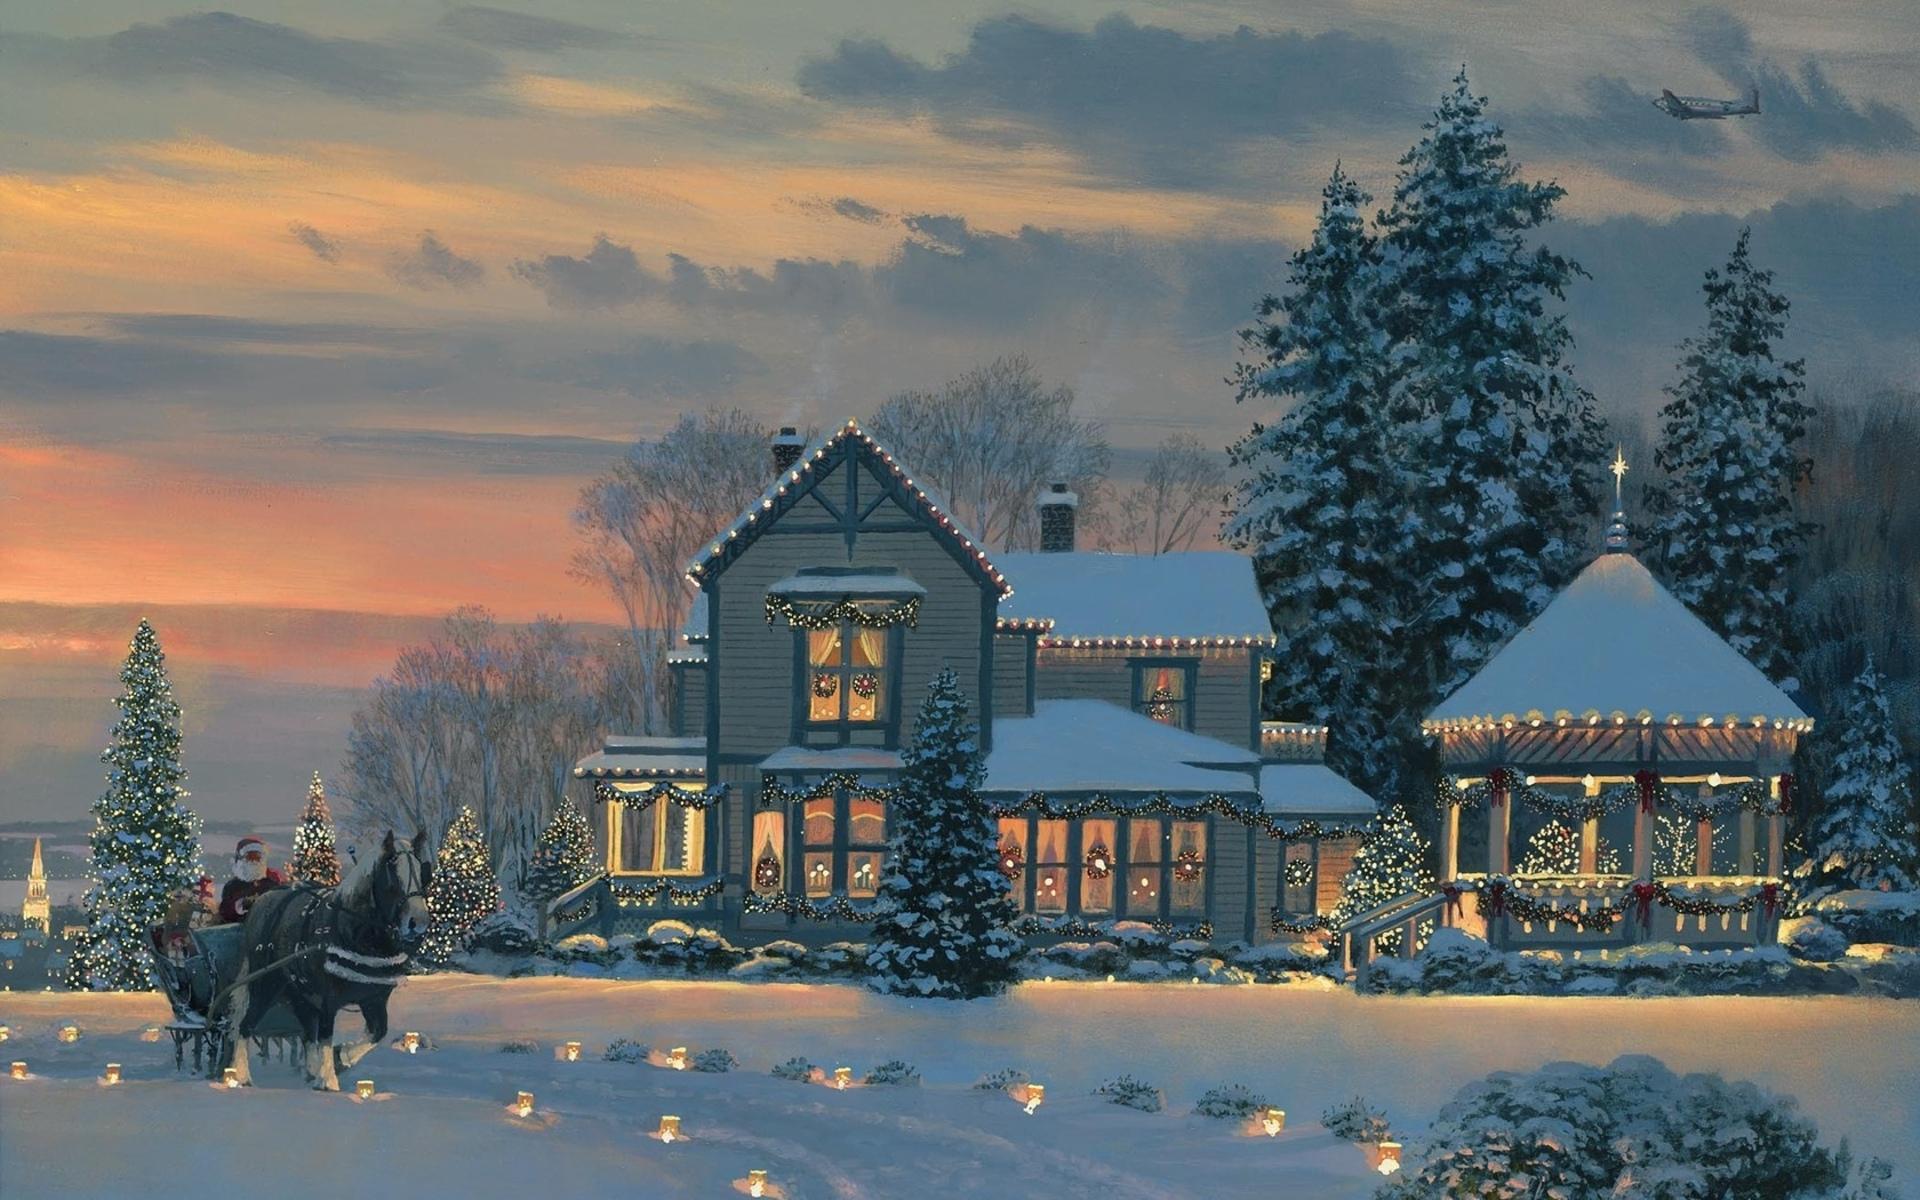 Christmas house painting - Christmas House Santa Claus Hd Wallpaper 1024x640 Christmas House